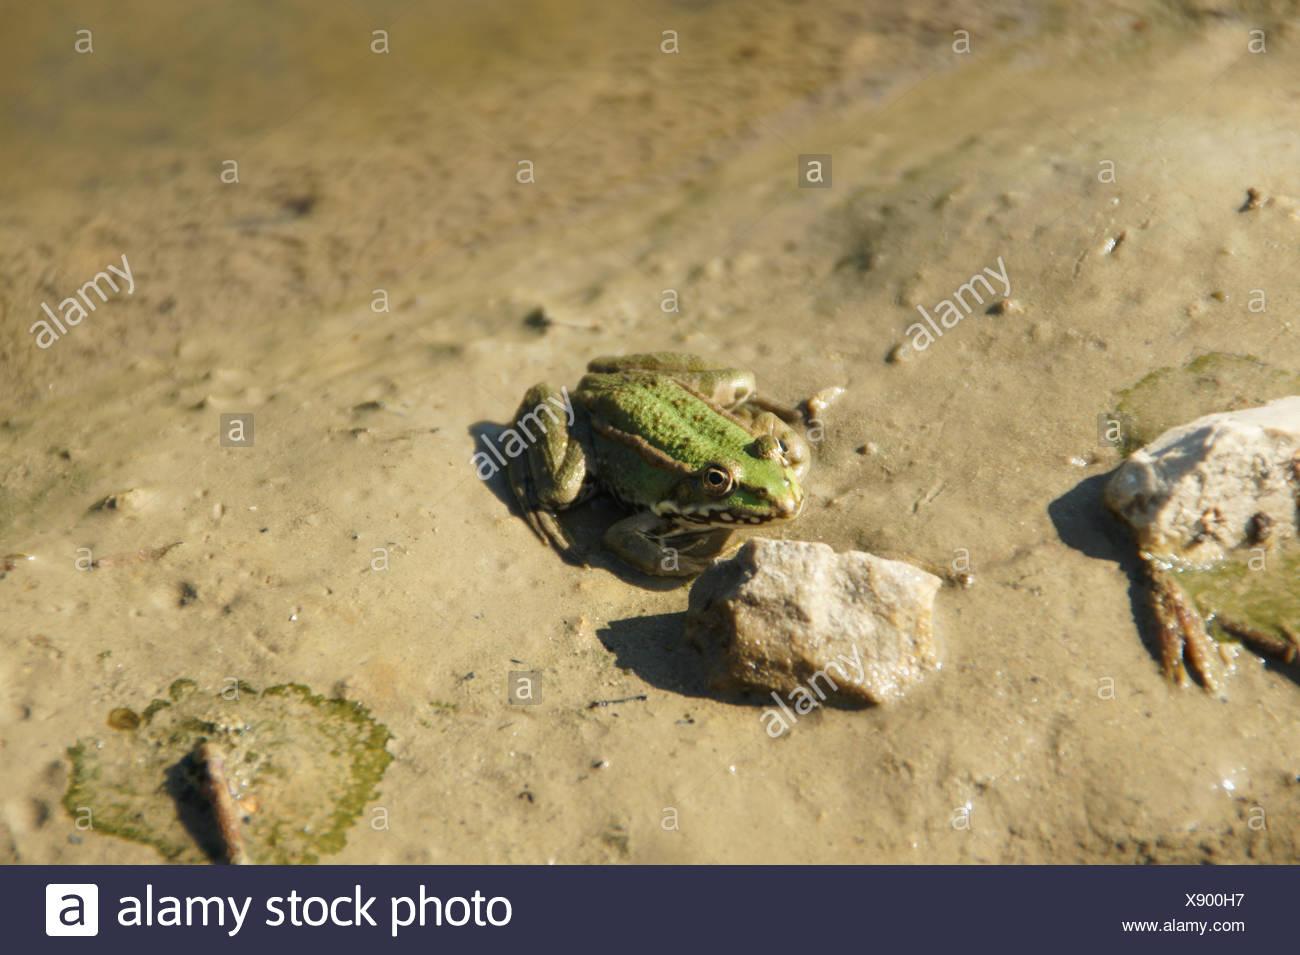 Rana esculenta, Frog - Stock Image